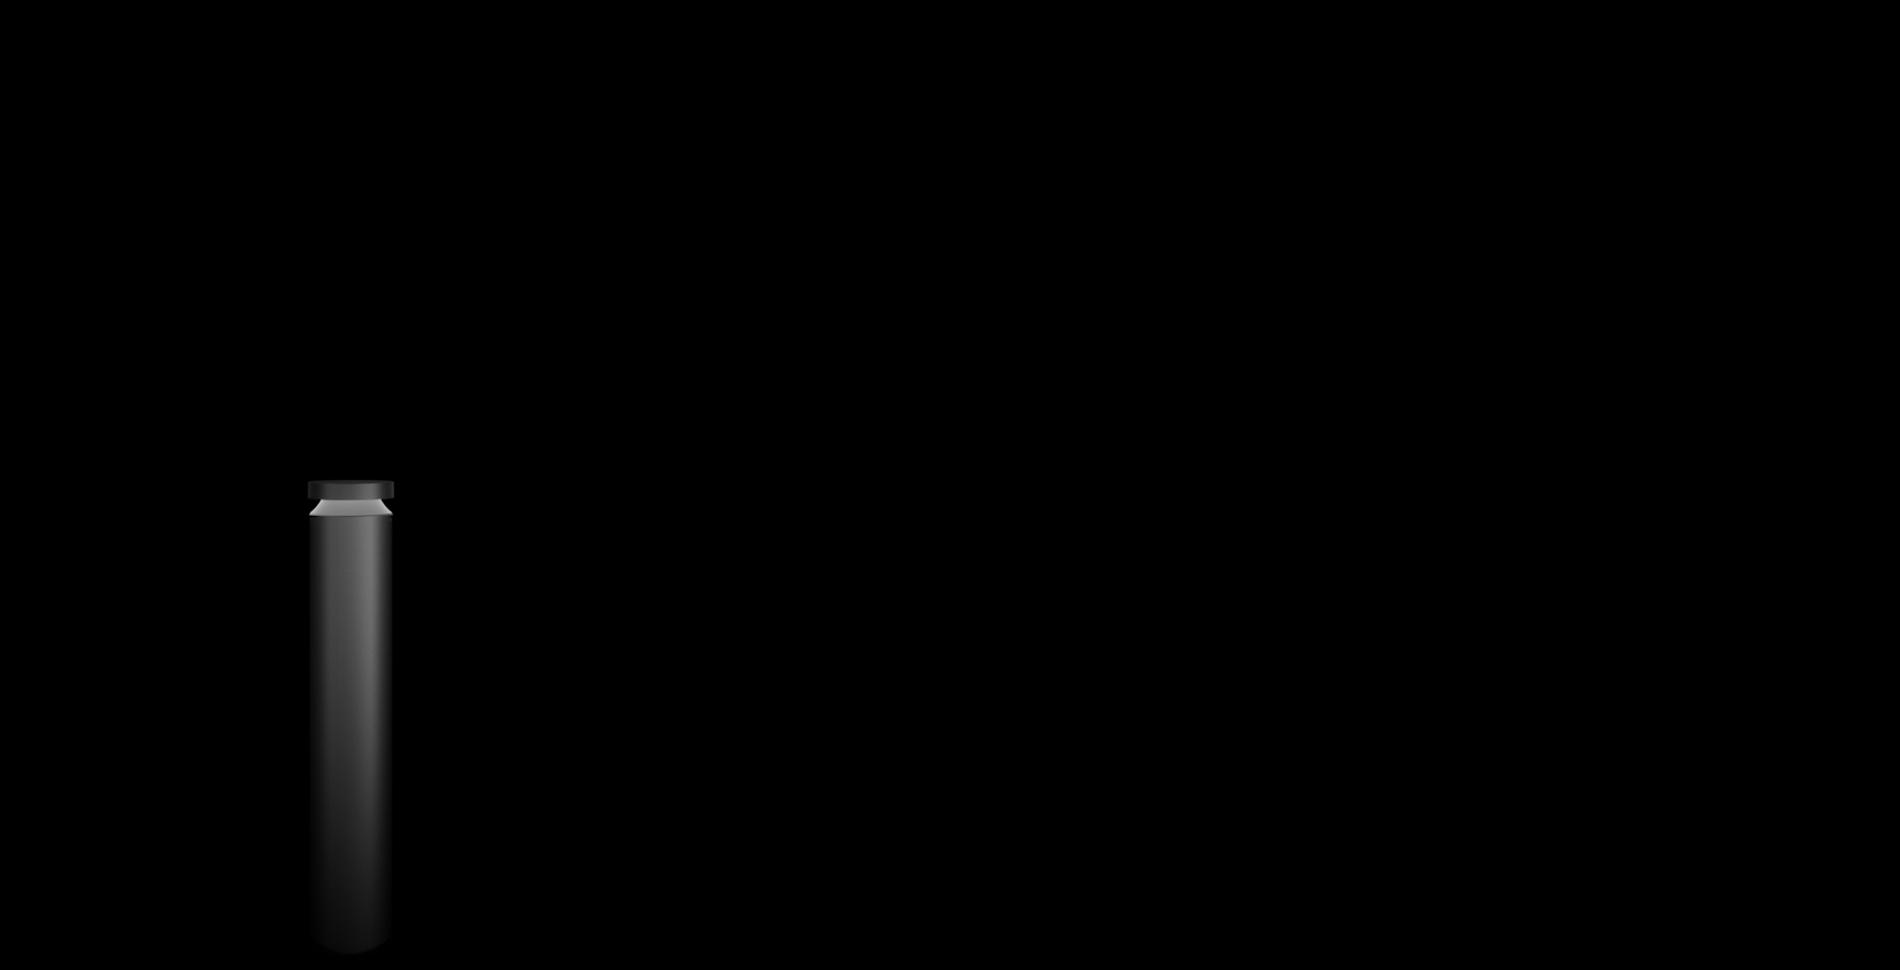 Sequenza-0224